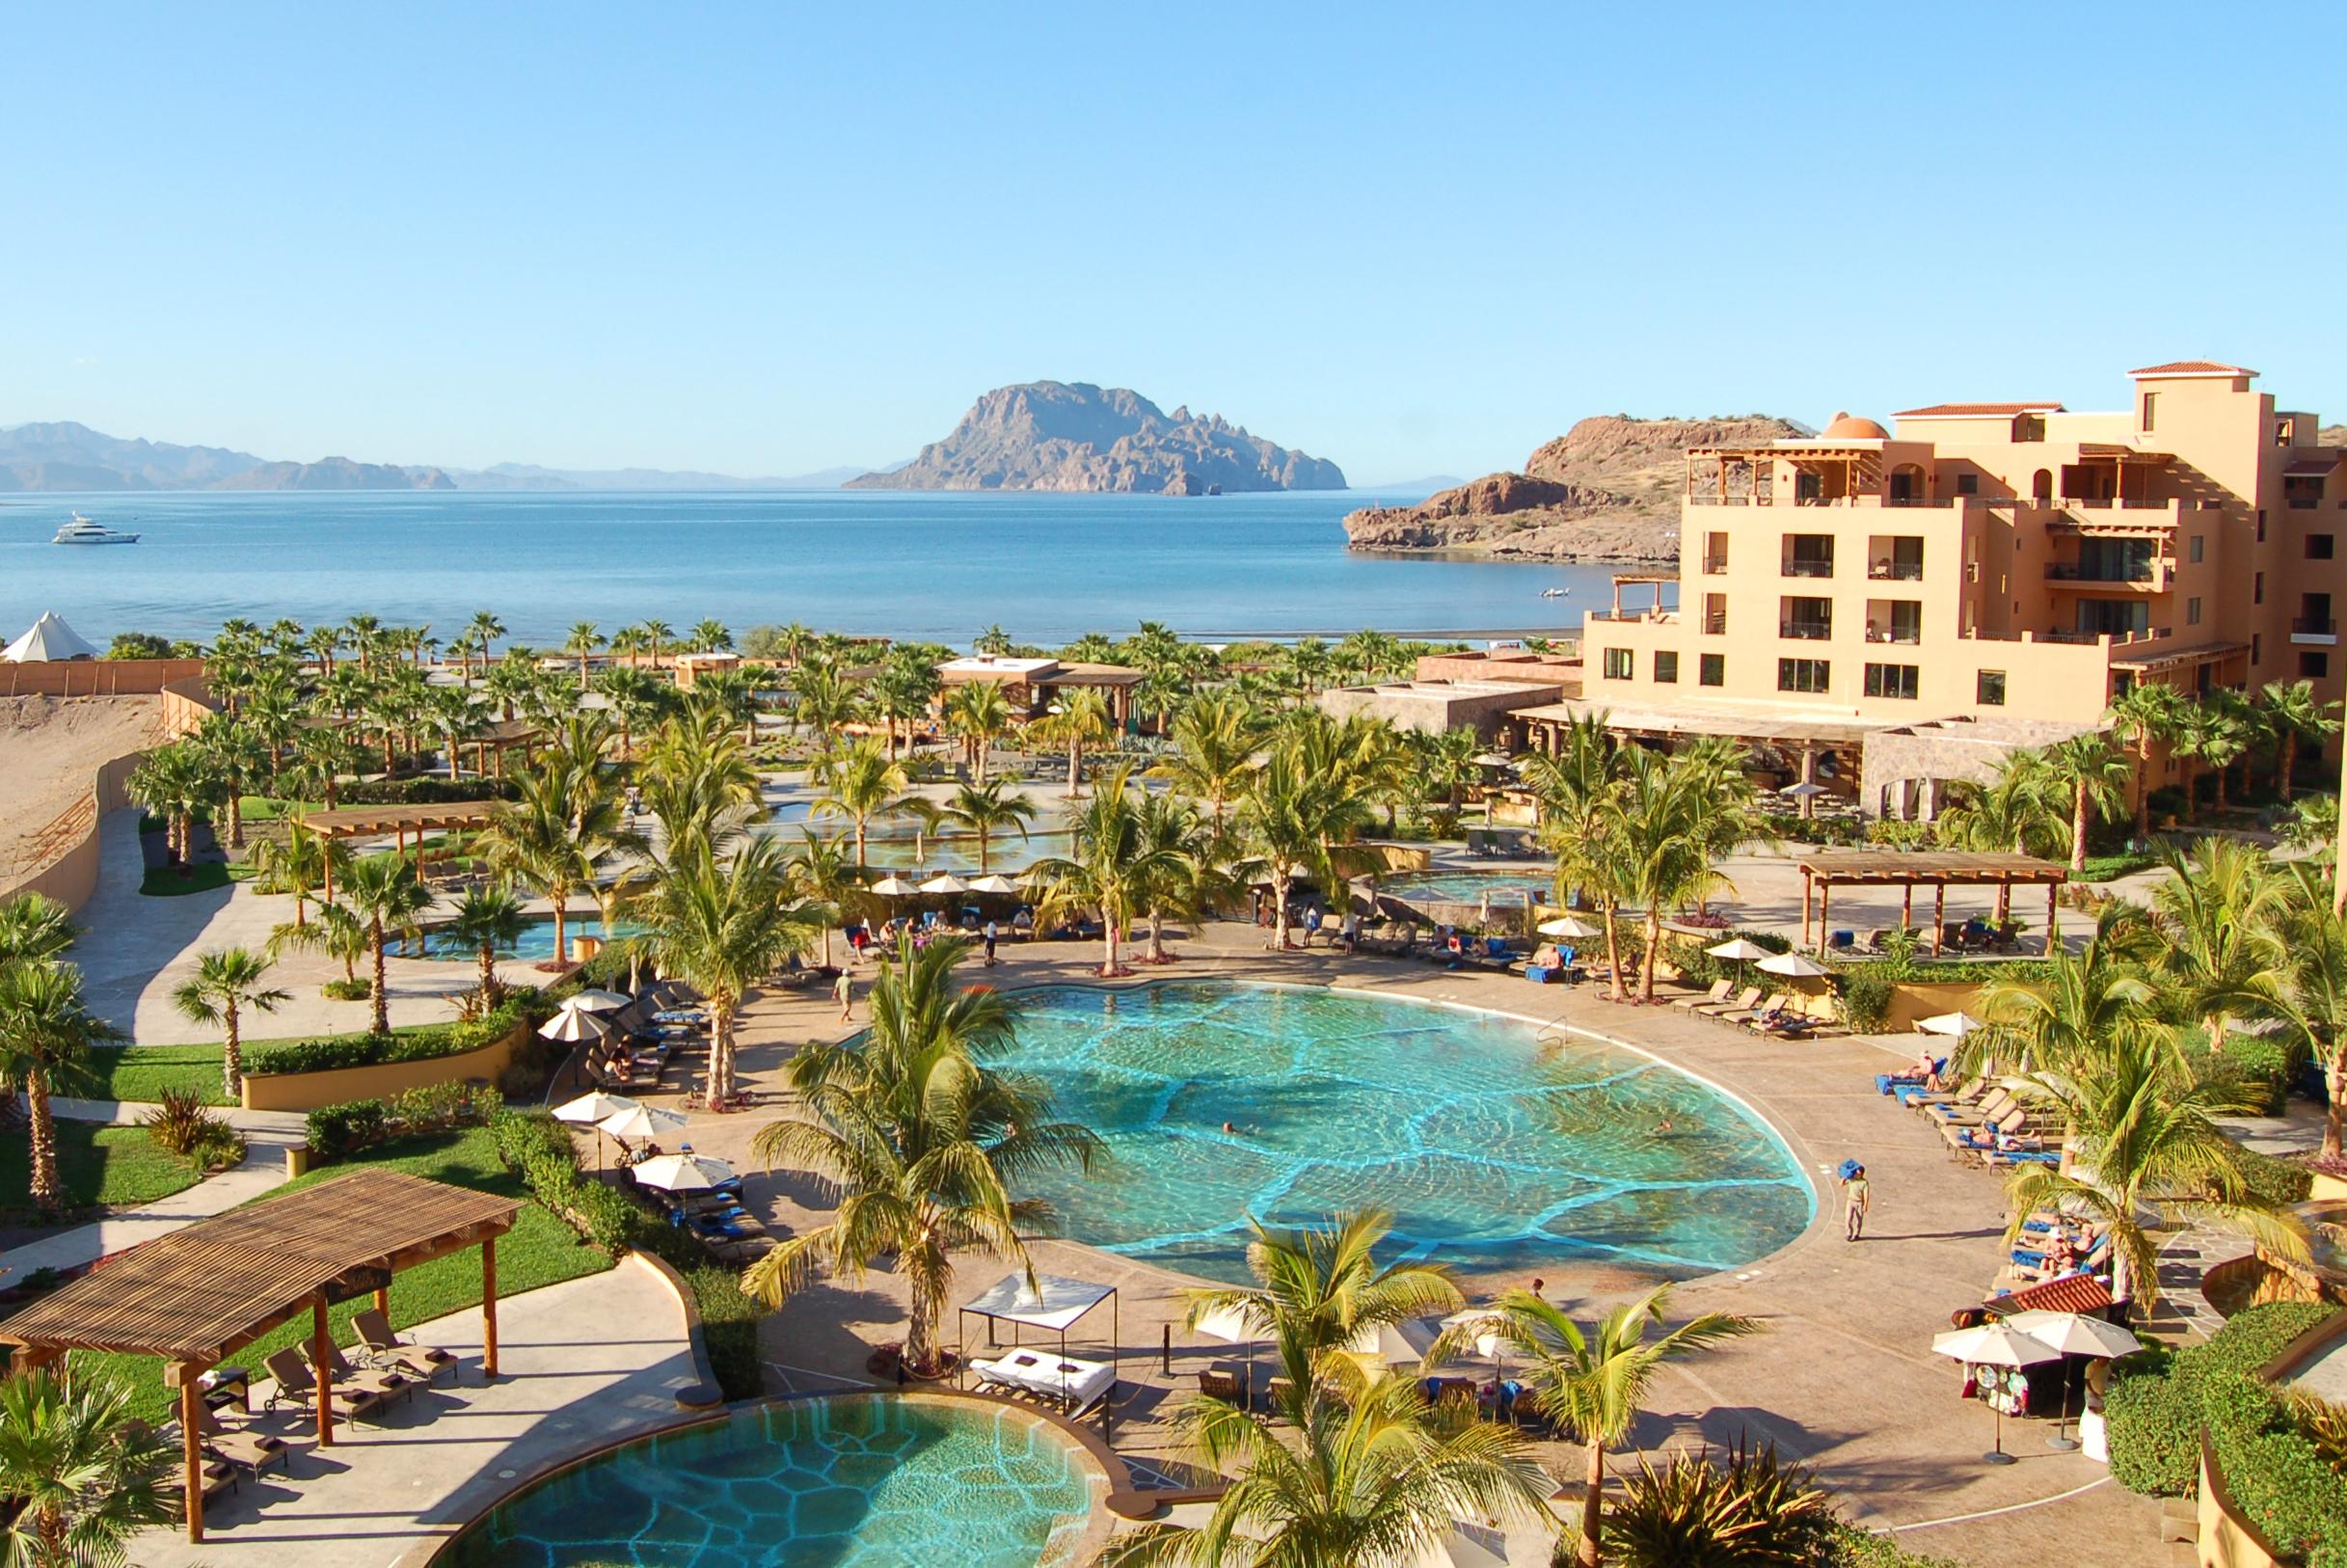 Villa Del Palmar At The Islands Of Loreto Luxury In A Rustic Paradise A Gringo In Mexico